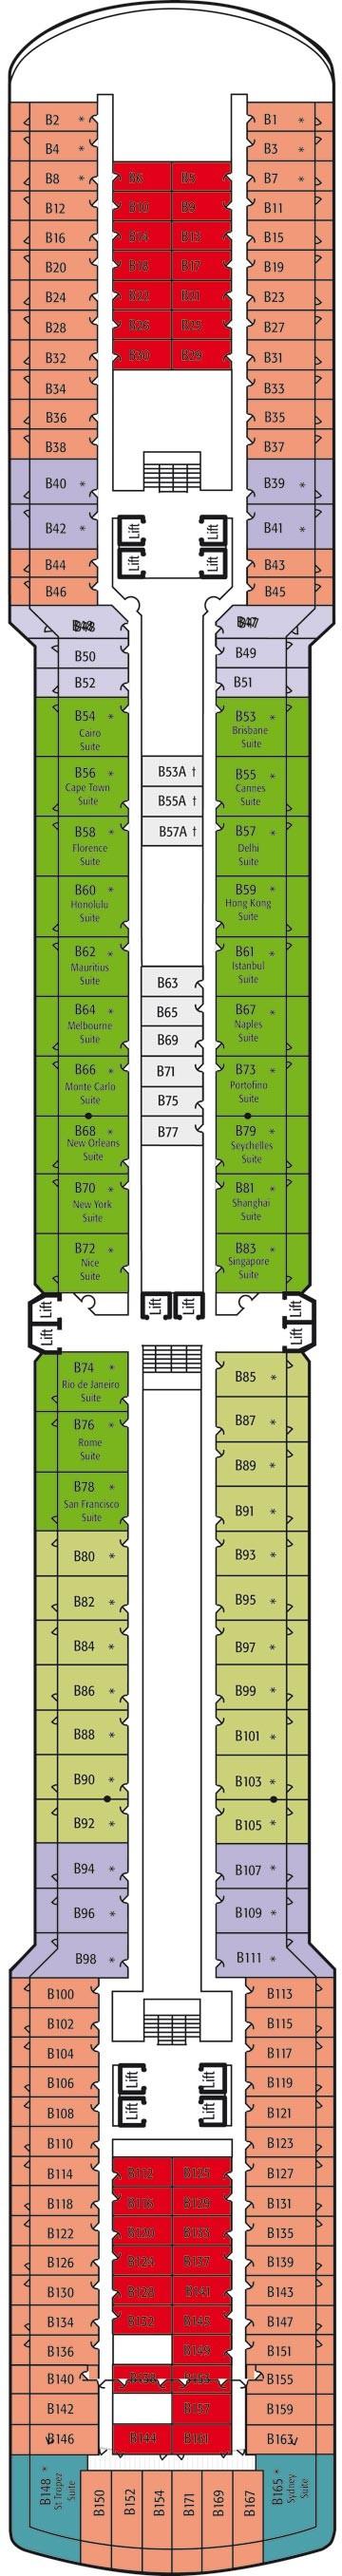 Pando cruises arcadia deals reviews more b deck deck plan baanklon Gallery